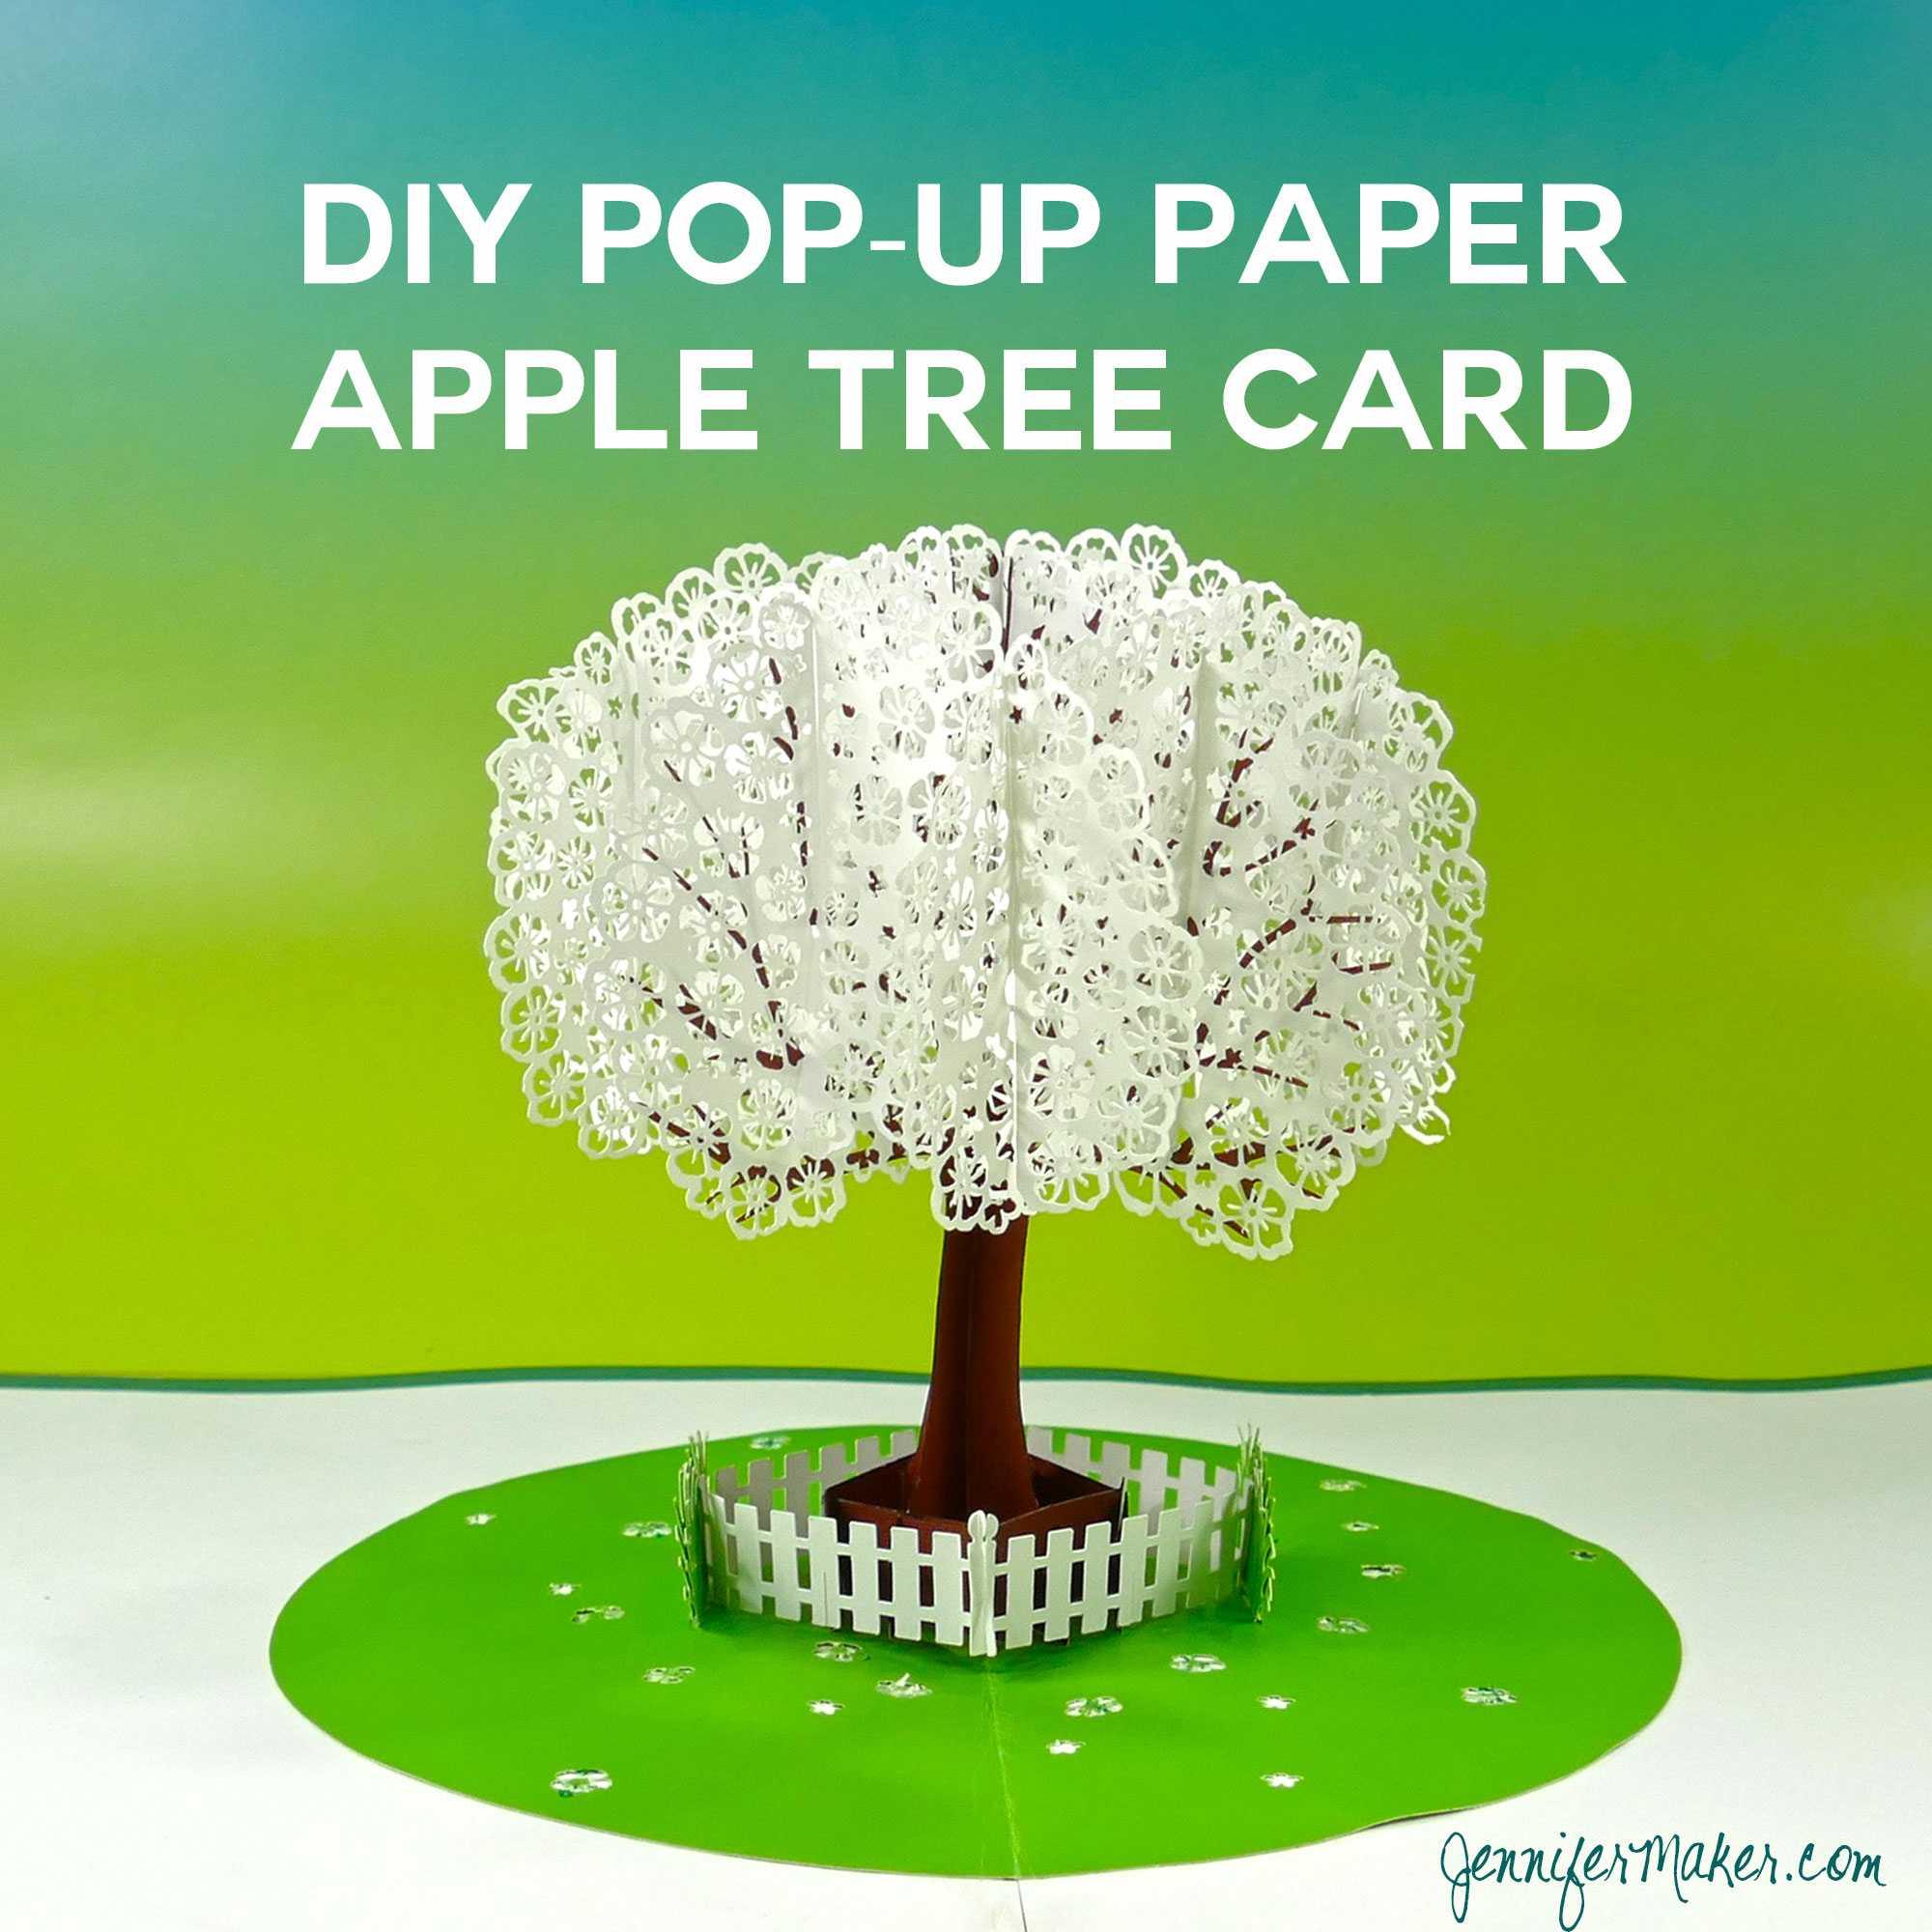 Pop-Up Paper Apple Tree Card (3D Sliceform) - Jennifer Maker pertaining to Pop Up Tree Card Template